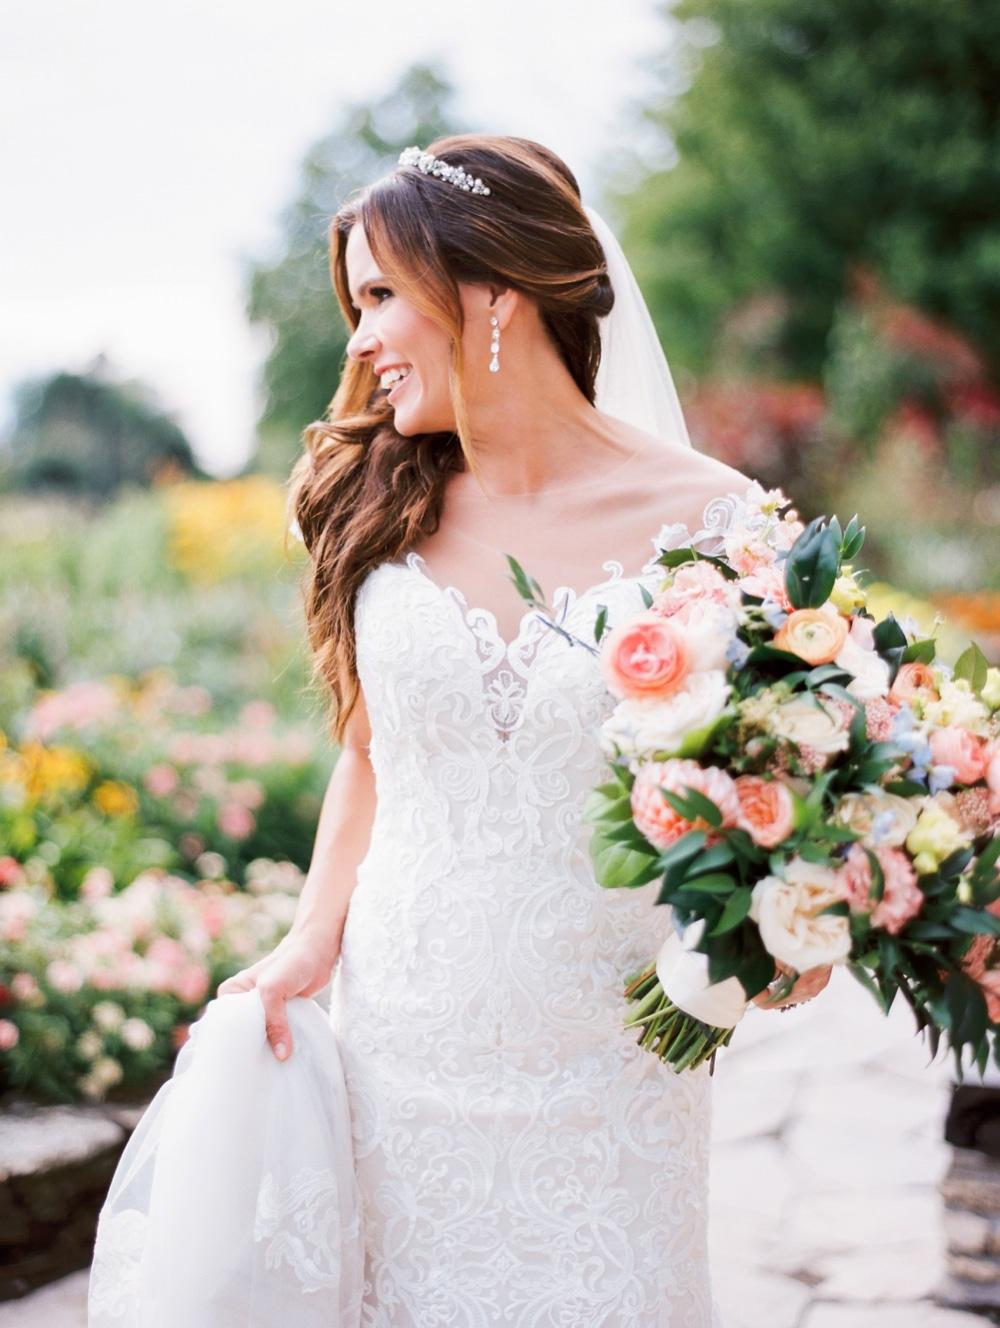 kristin-la-voie-photography-henry-ford-museum-detroit-wedding-photographer-81